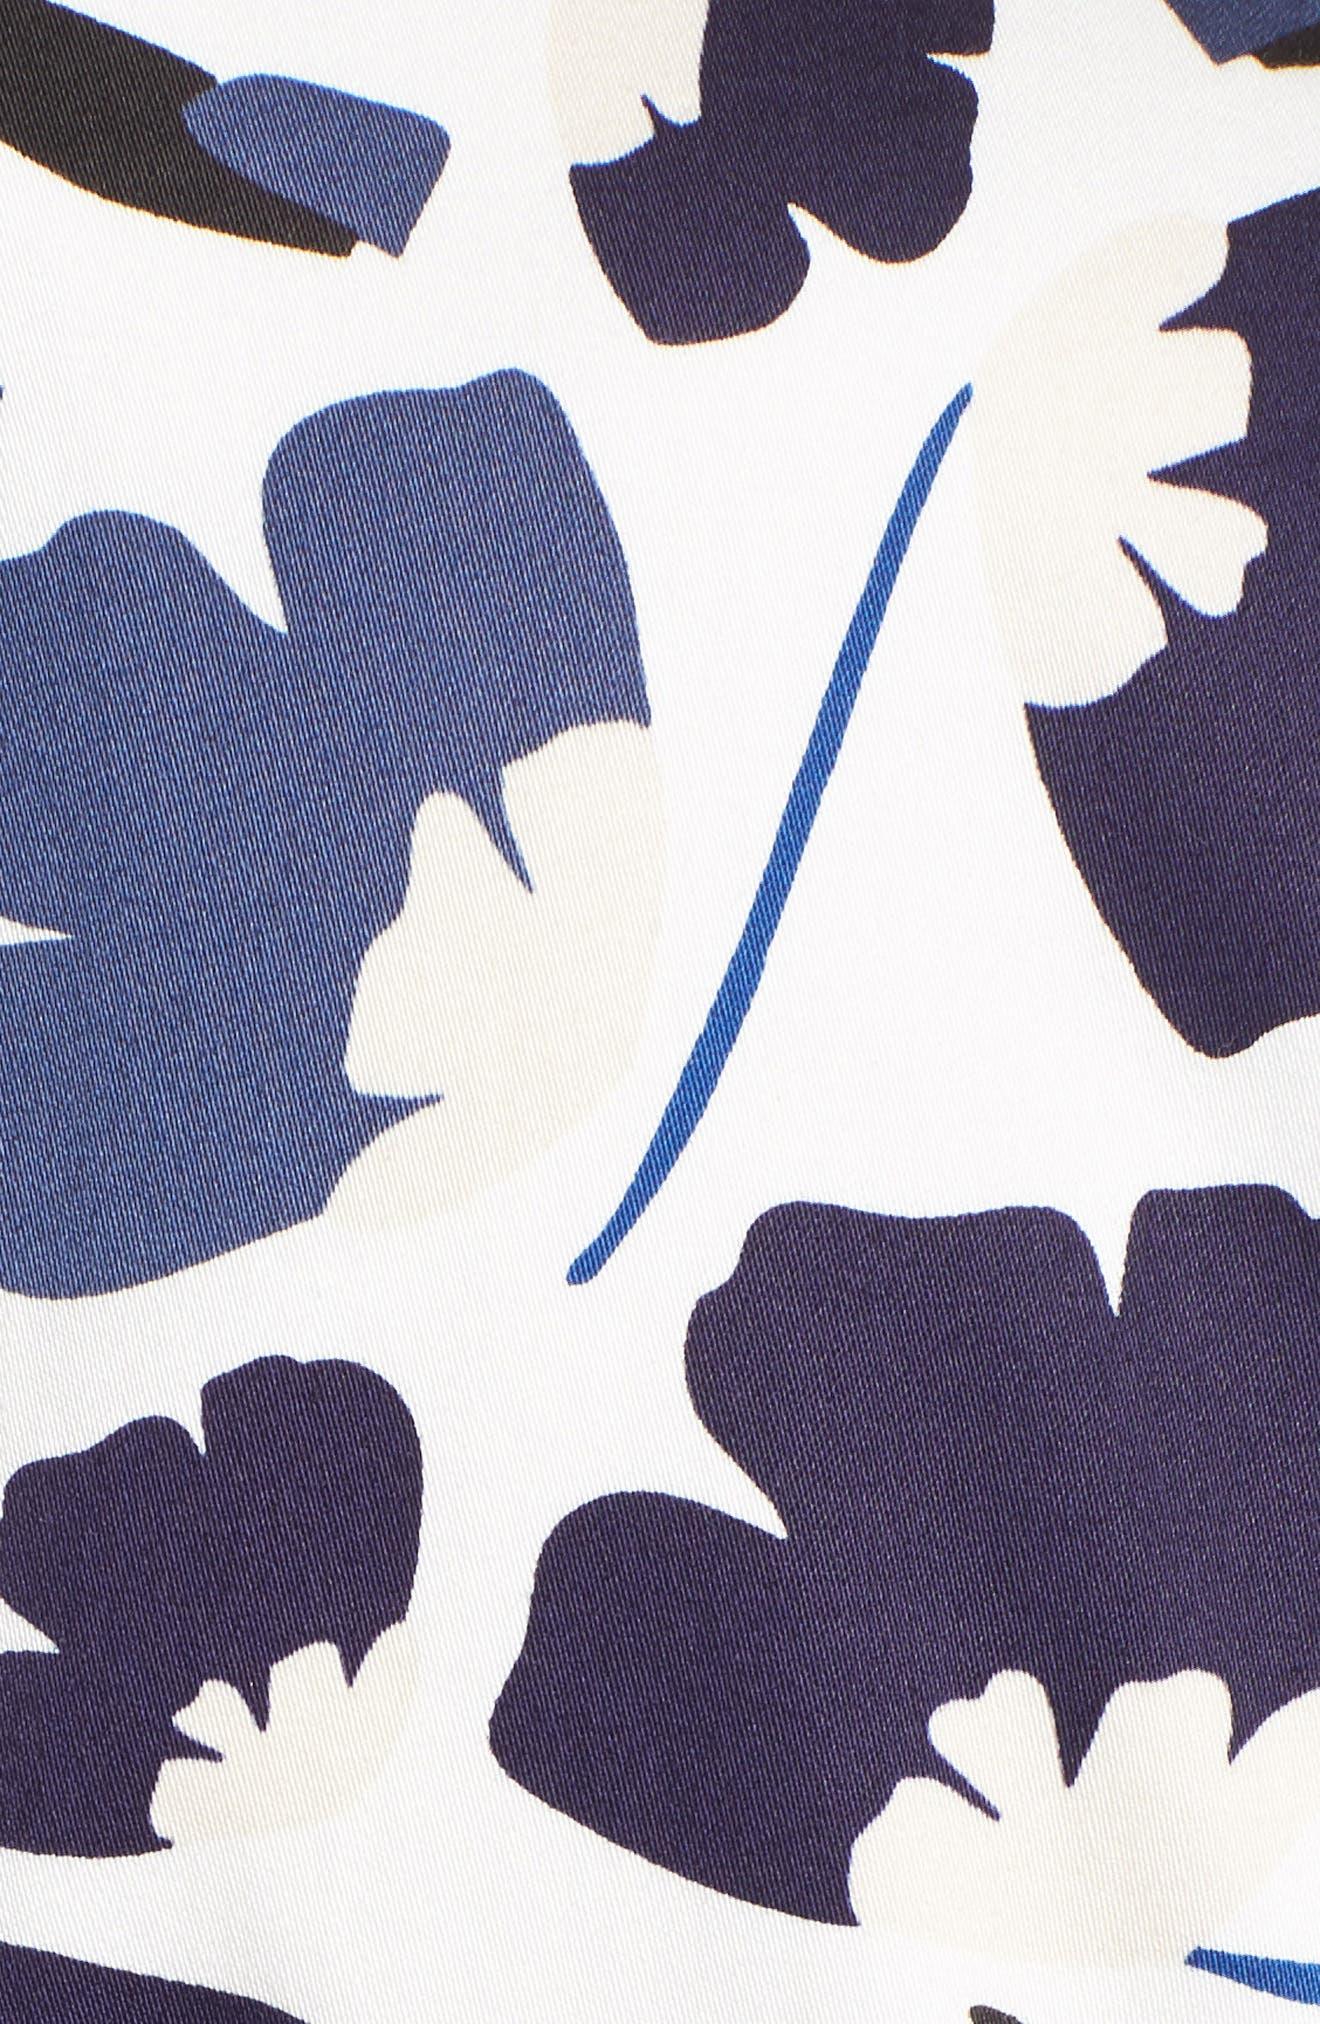 Humboldt Cotton Sateen Dress,                             Alternate thumbnail 5, color,                             410